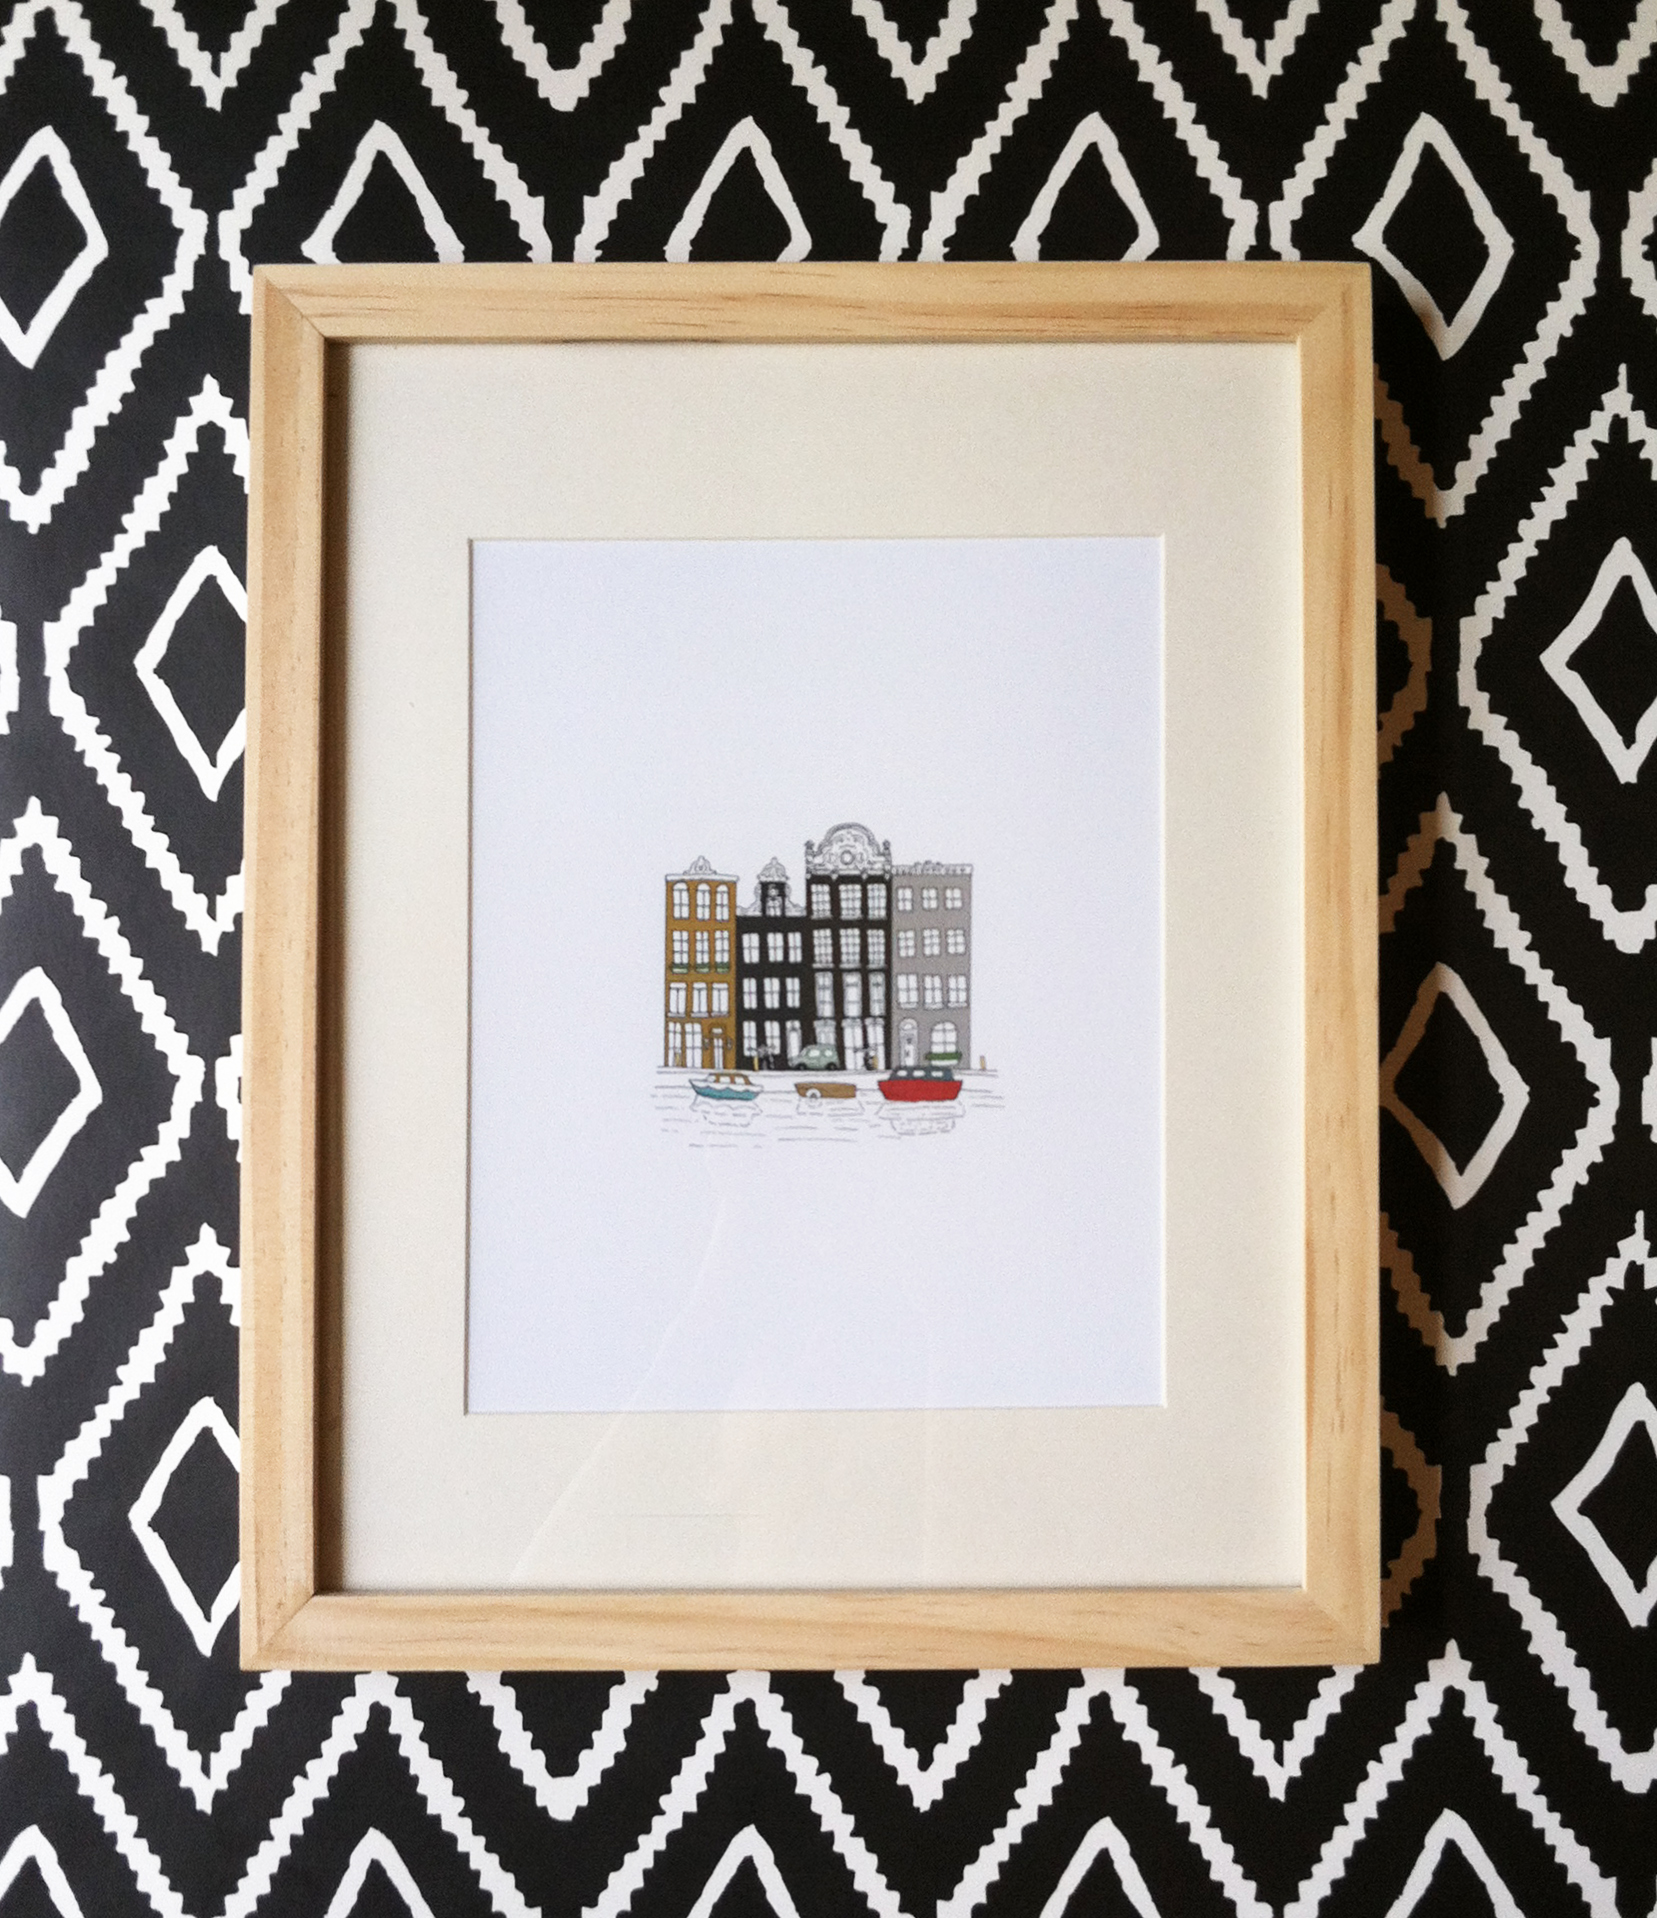 Amsterdam Print + Diamond Wallpaper. Kathryn Zaremba 2014